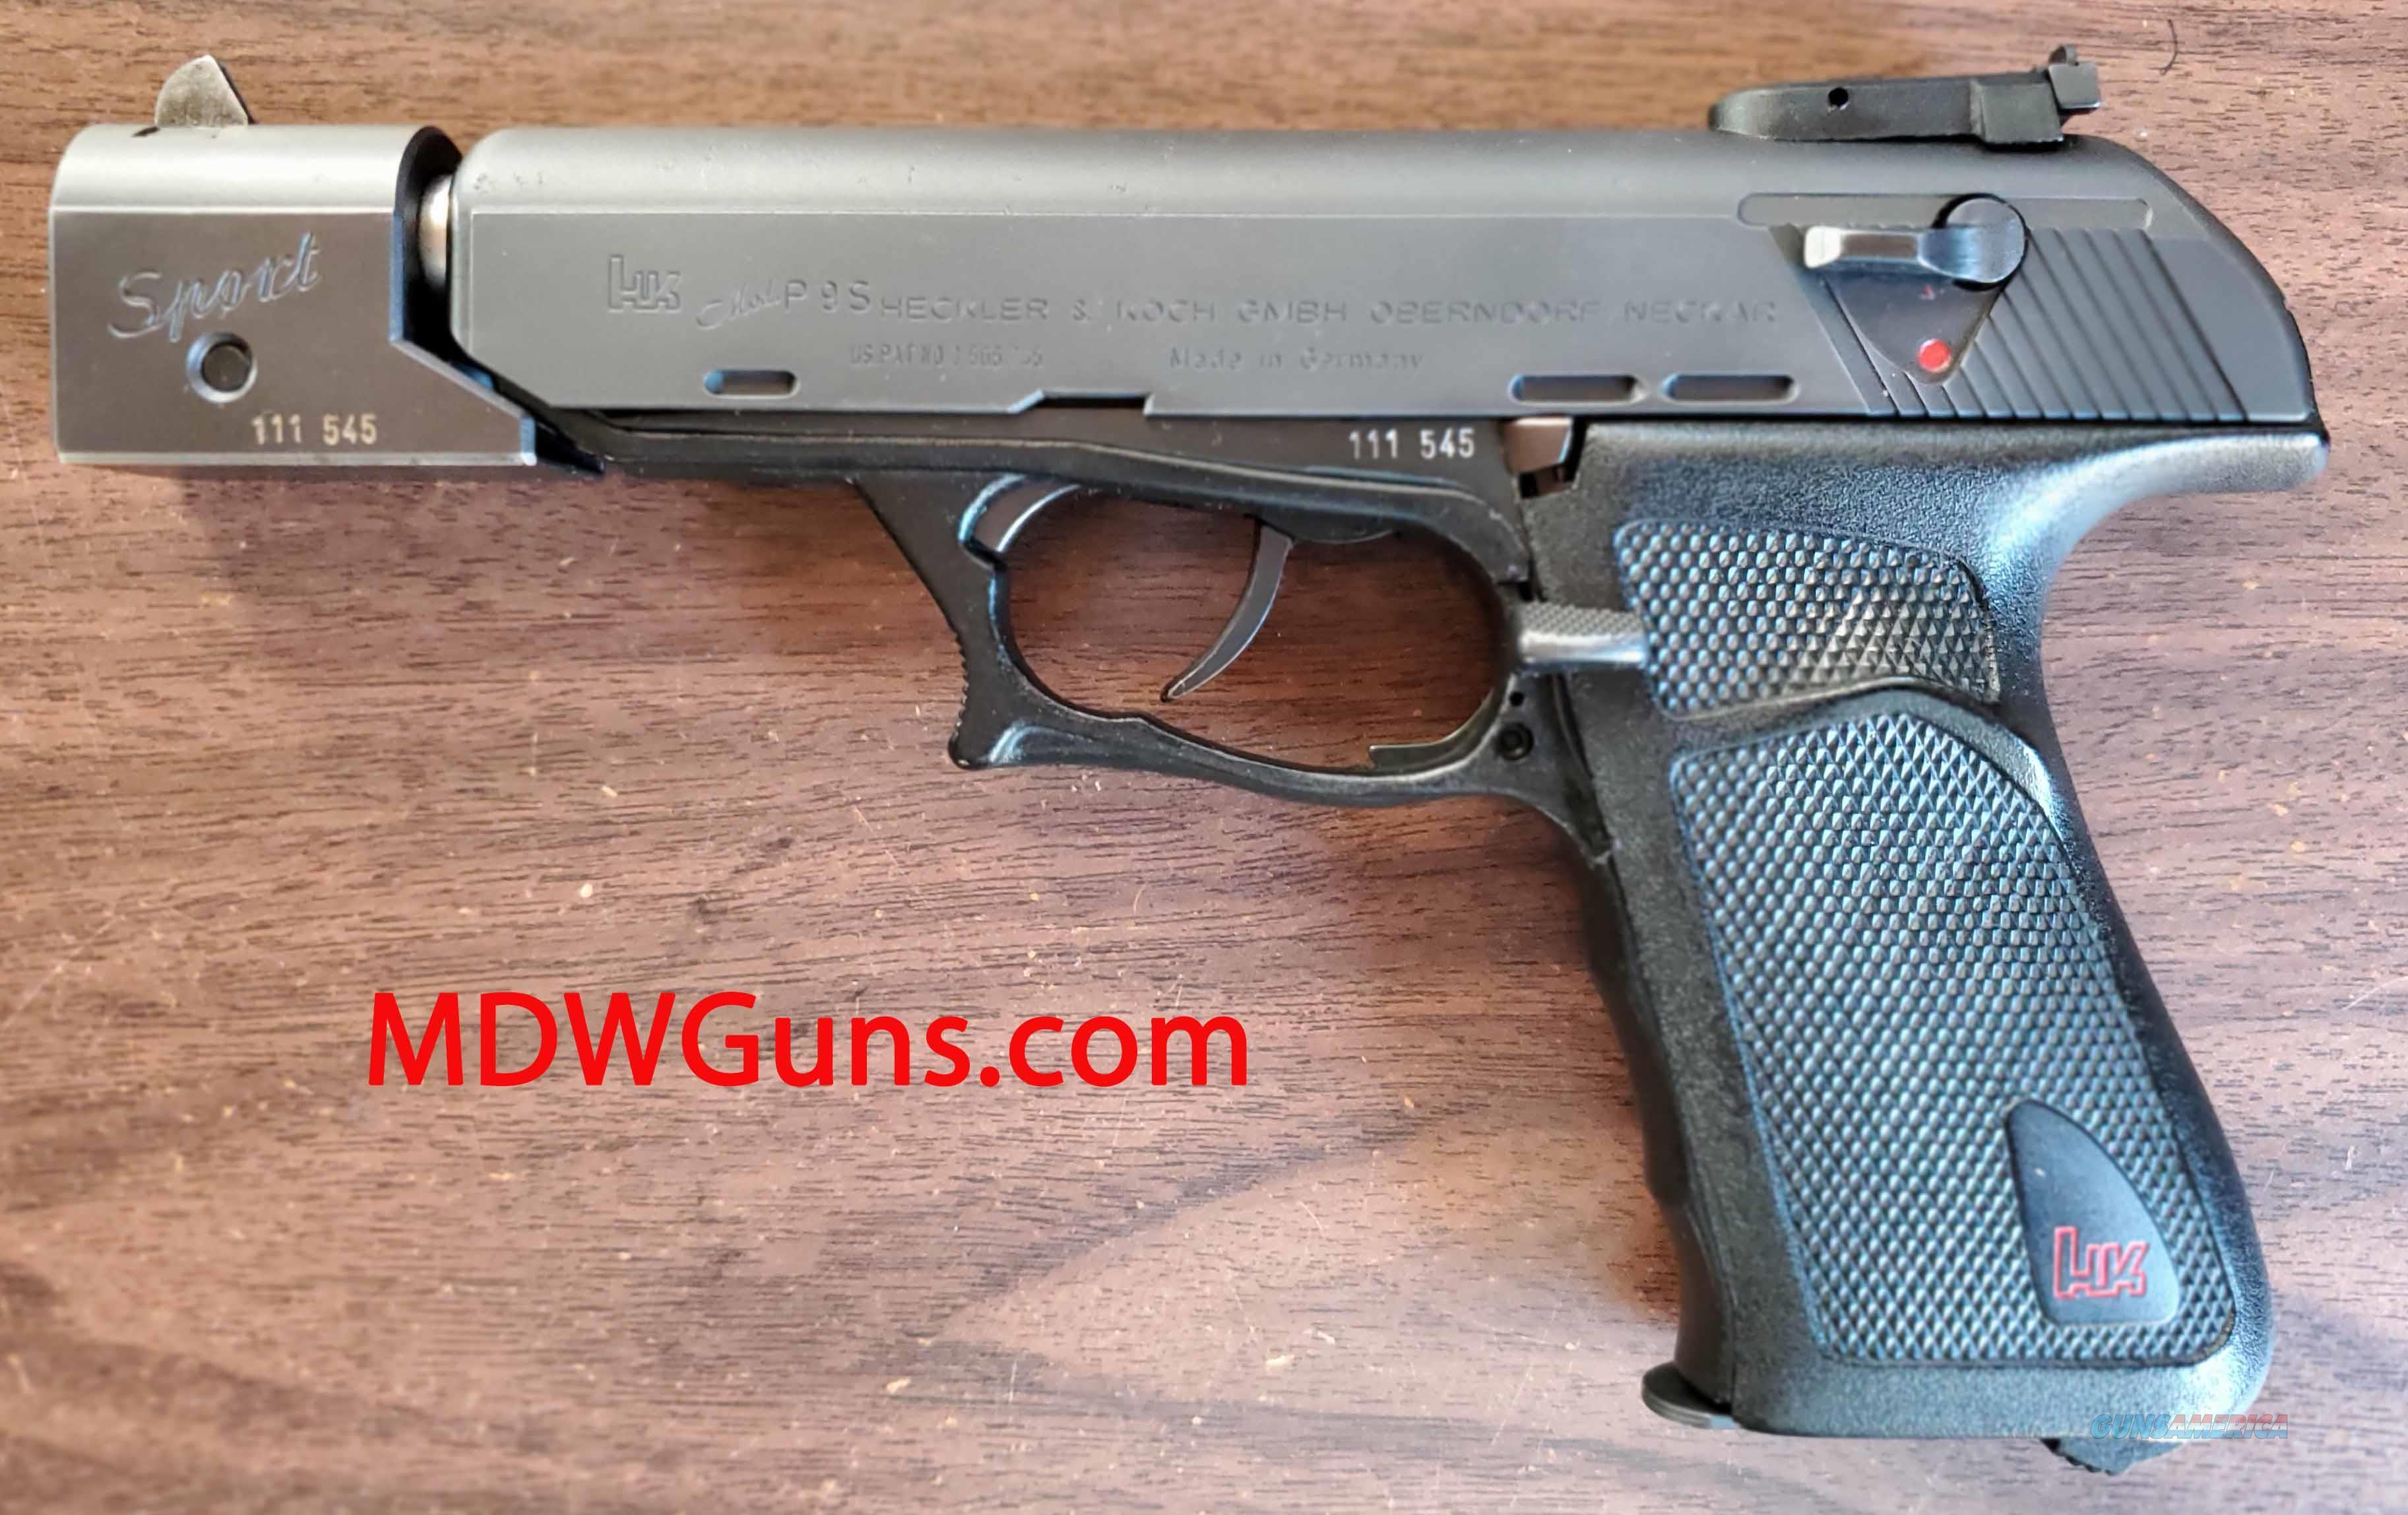 HK P9S 9mm Sport  Guns > Pistols > Heckler & Koch Pistols > SteelFrame